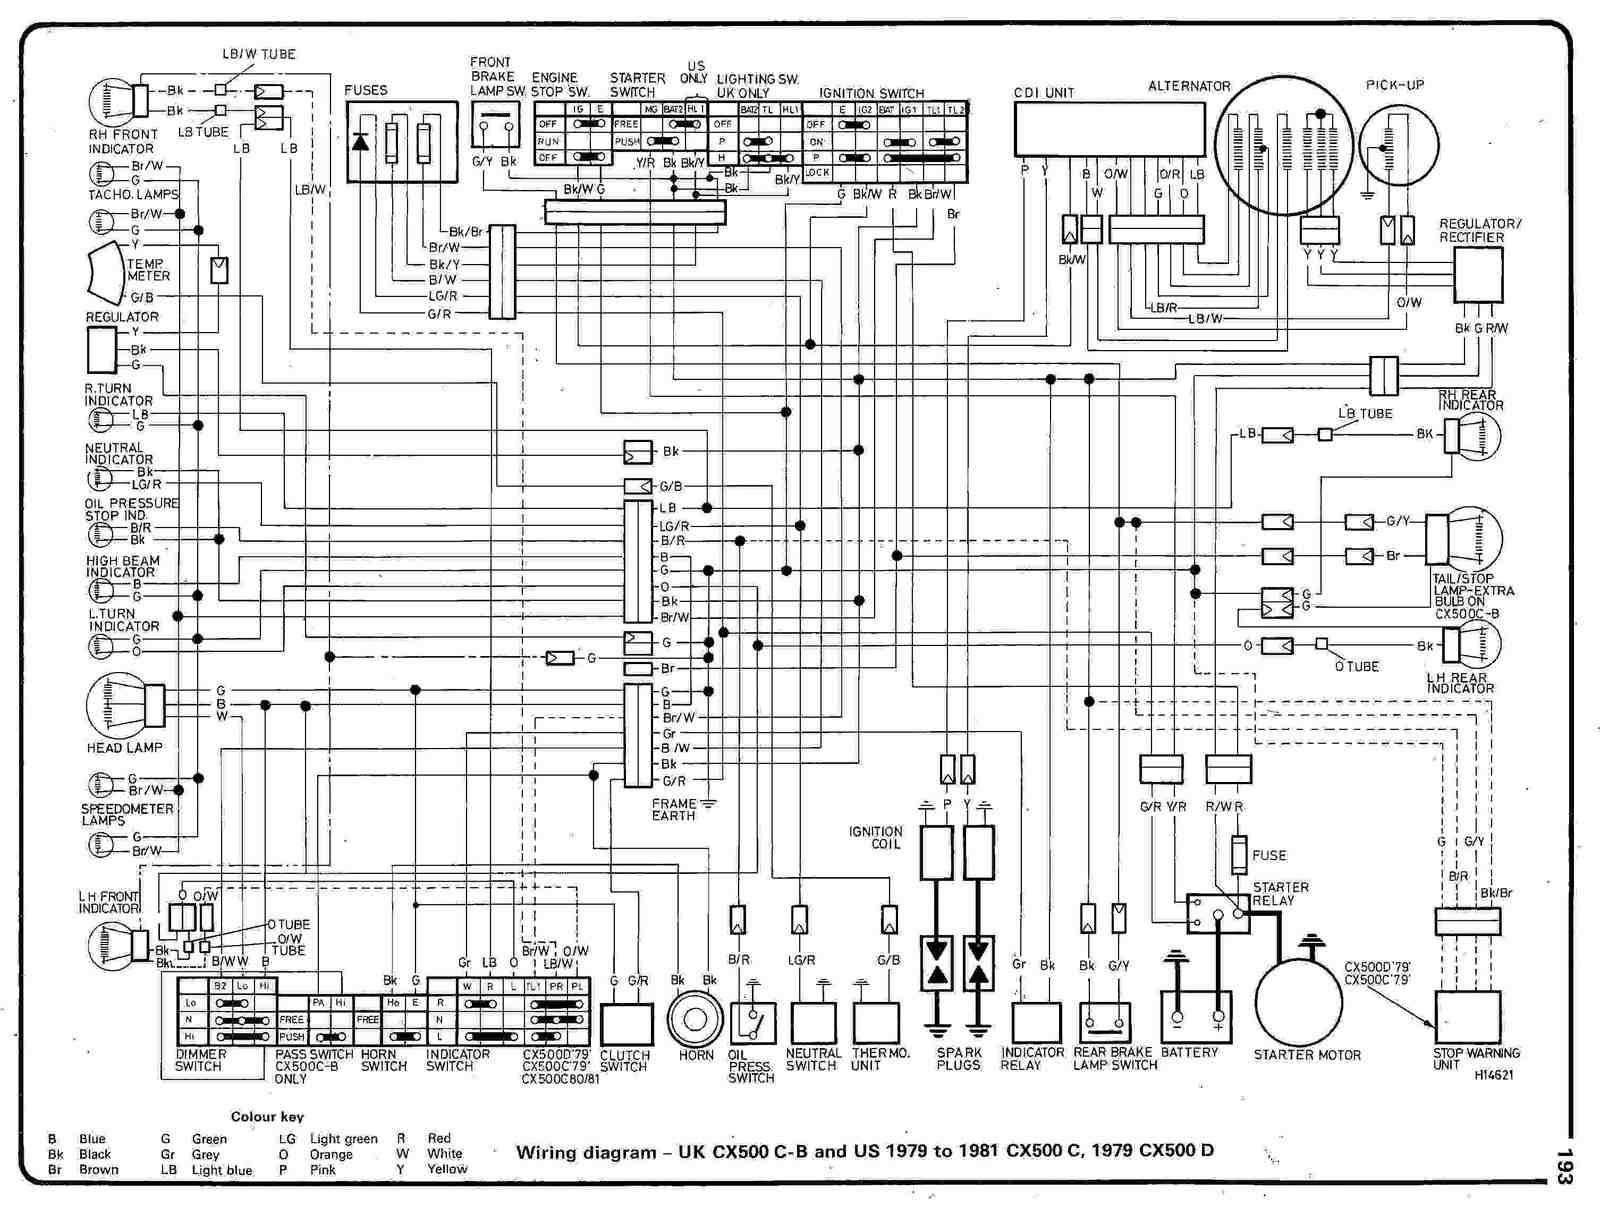 Honda Ft Wiring Diagram on honda sl350 wiring diagram, honda sl70 wiring diagram, honda shadow 750 wiring diagram, honda vt1100c wiring diagram, honda ct70 wiring diagram, honda z50 wiring diagram, honda xbr500 wiring diagram, honda xr250 wiring diagram, honda sl100 wiring diagram, honda ascot wiring diagram, honda xr80 wiring diagram, honda gl500 wiring diagram, honda 50 wiring diagram, honda cb1000c wiring diagram, honda crf50 wiring diagram, honda cb400f wiring diagram, honda spree wiring diagram, honda cb750 wiring diagram, honda cb1000 wiring diagram, honda cx500 wiring diagram,